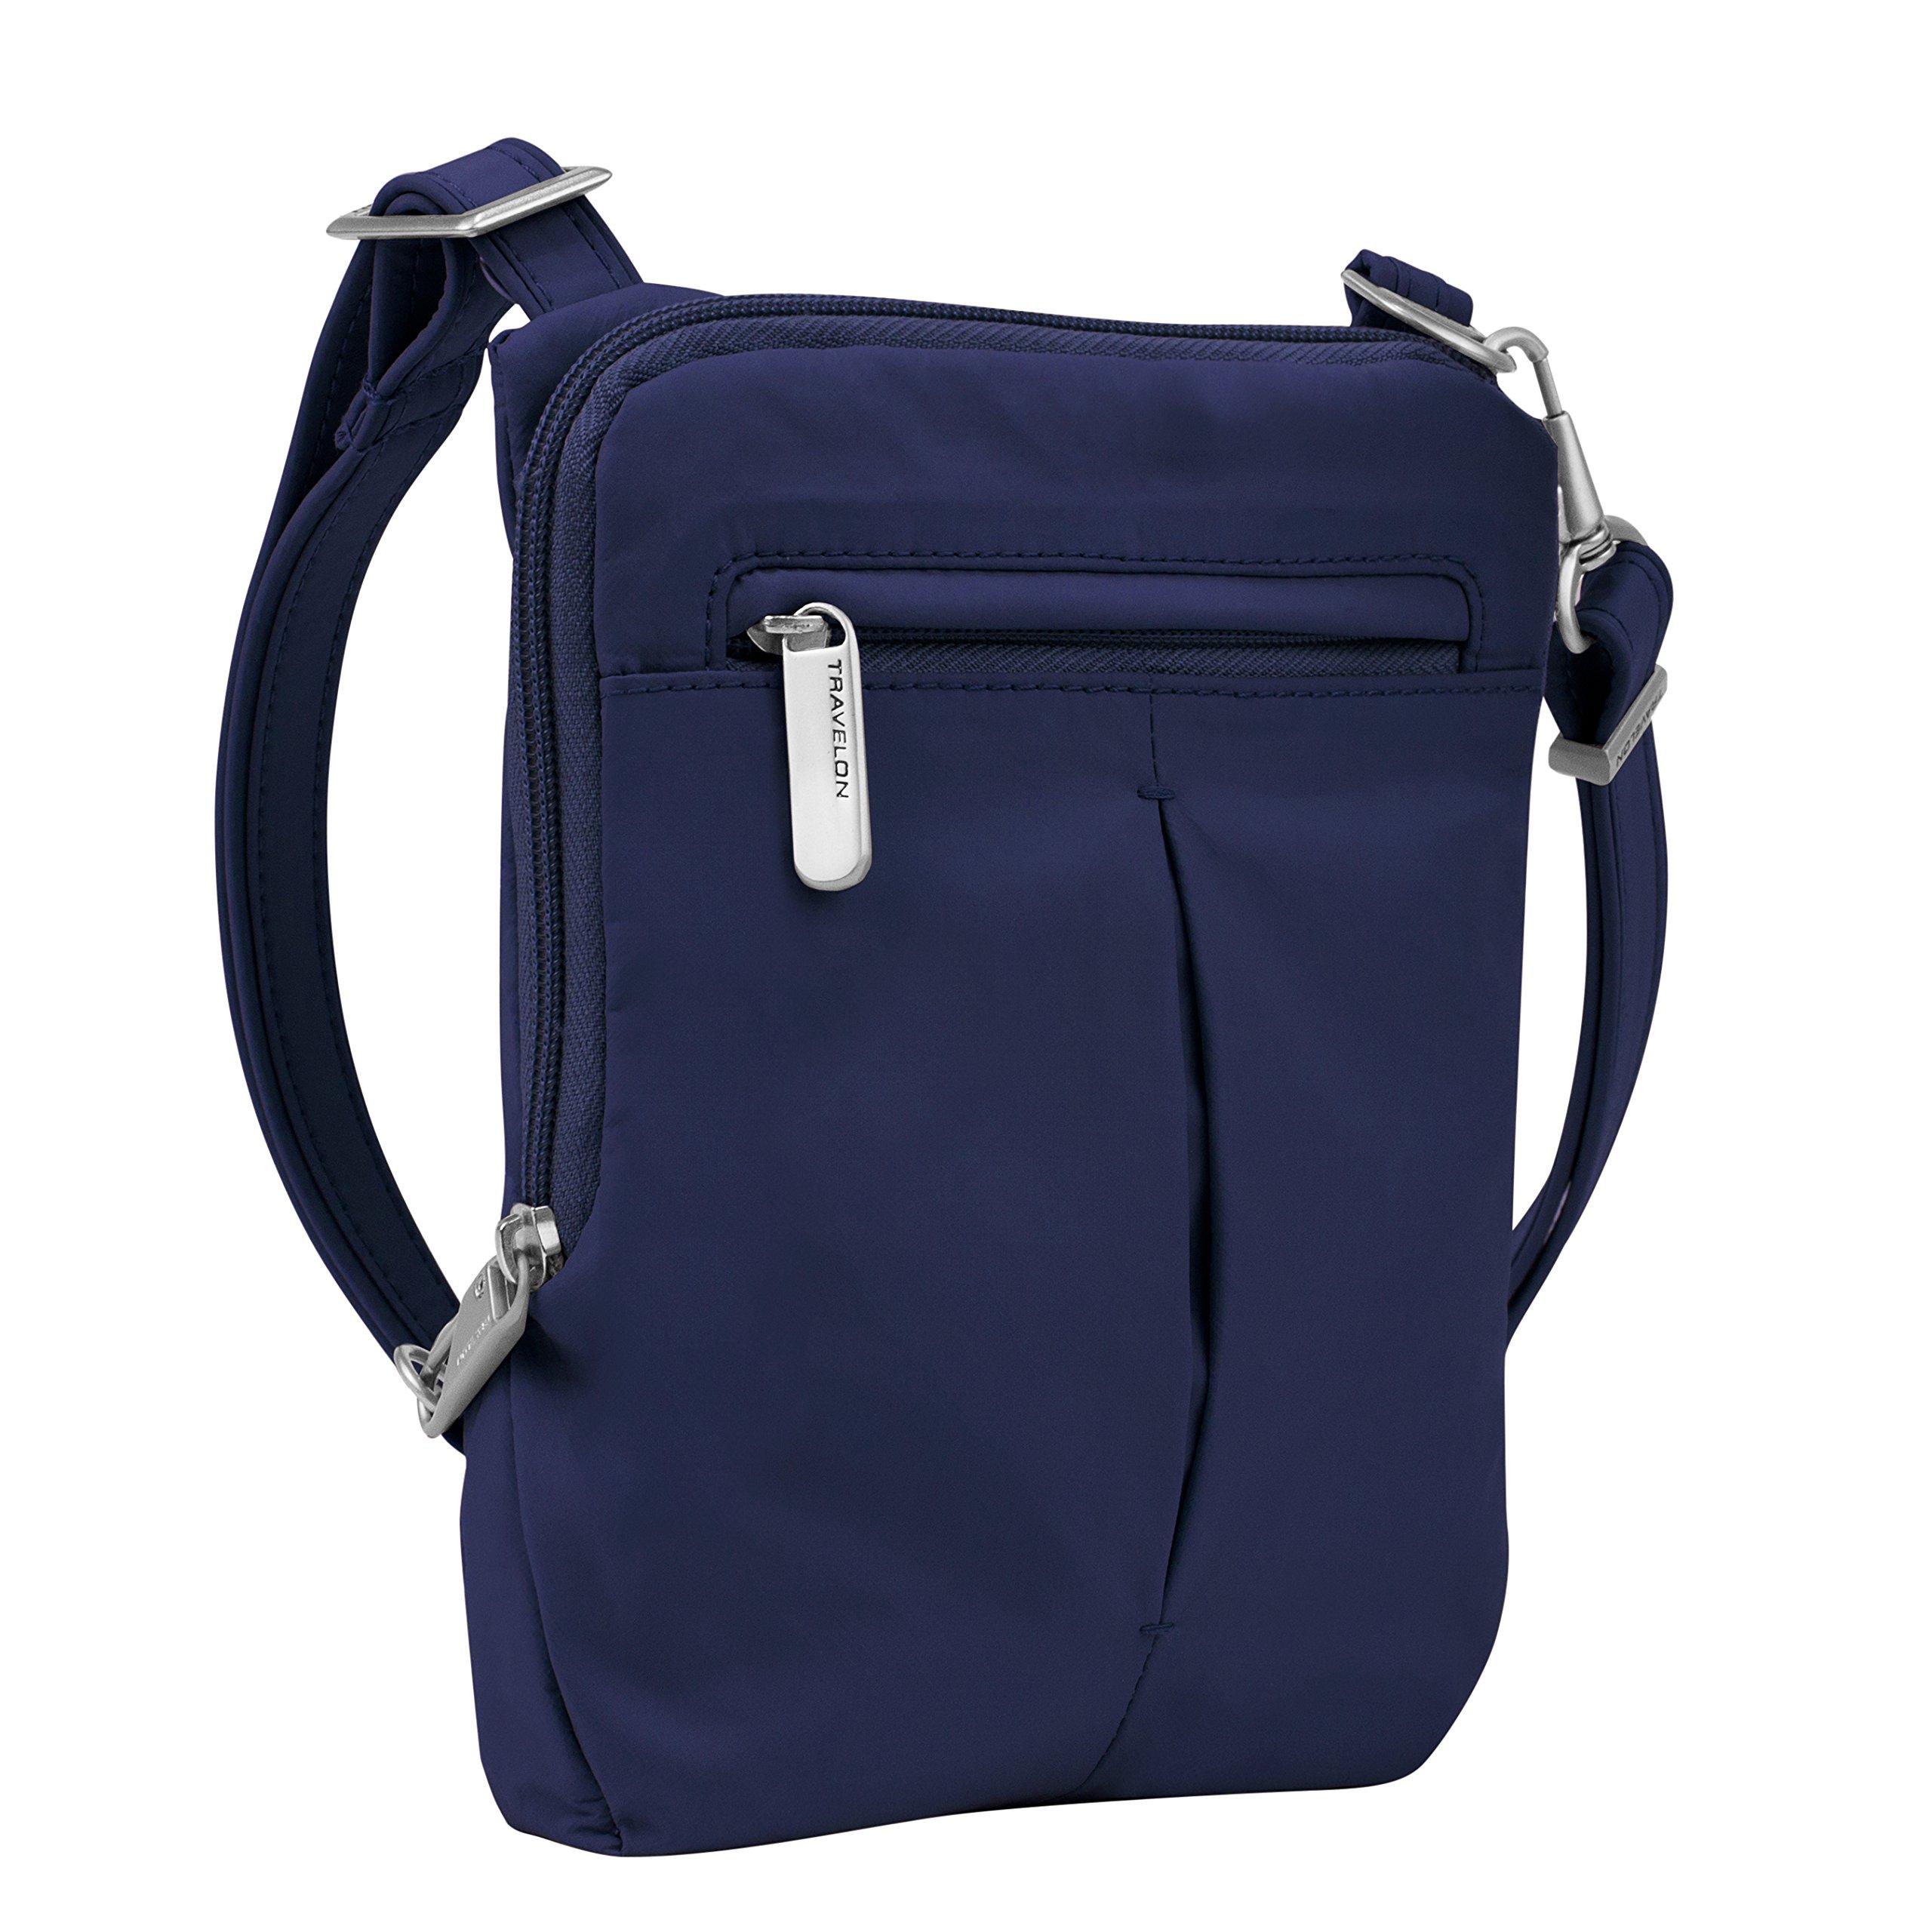 Travelon Anti-Theft Classic Light Mini Crossbody Bag, Lush Blue